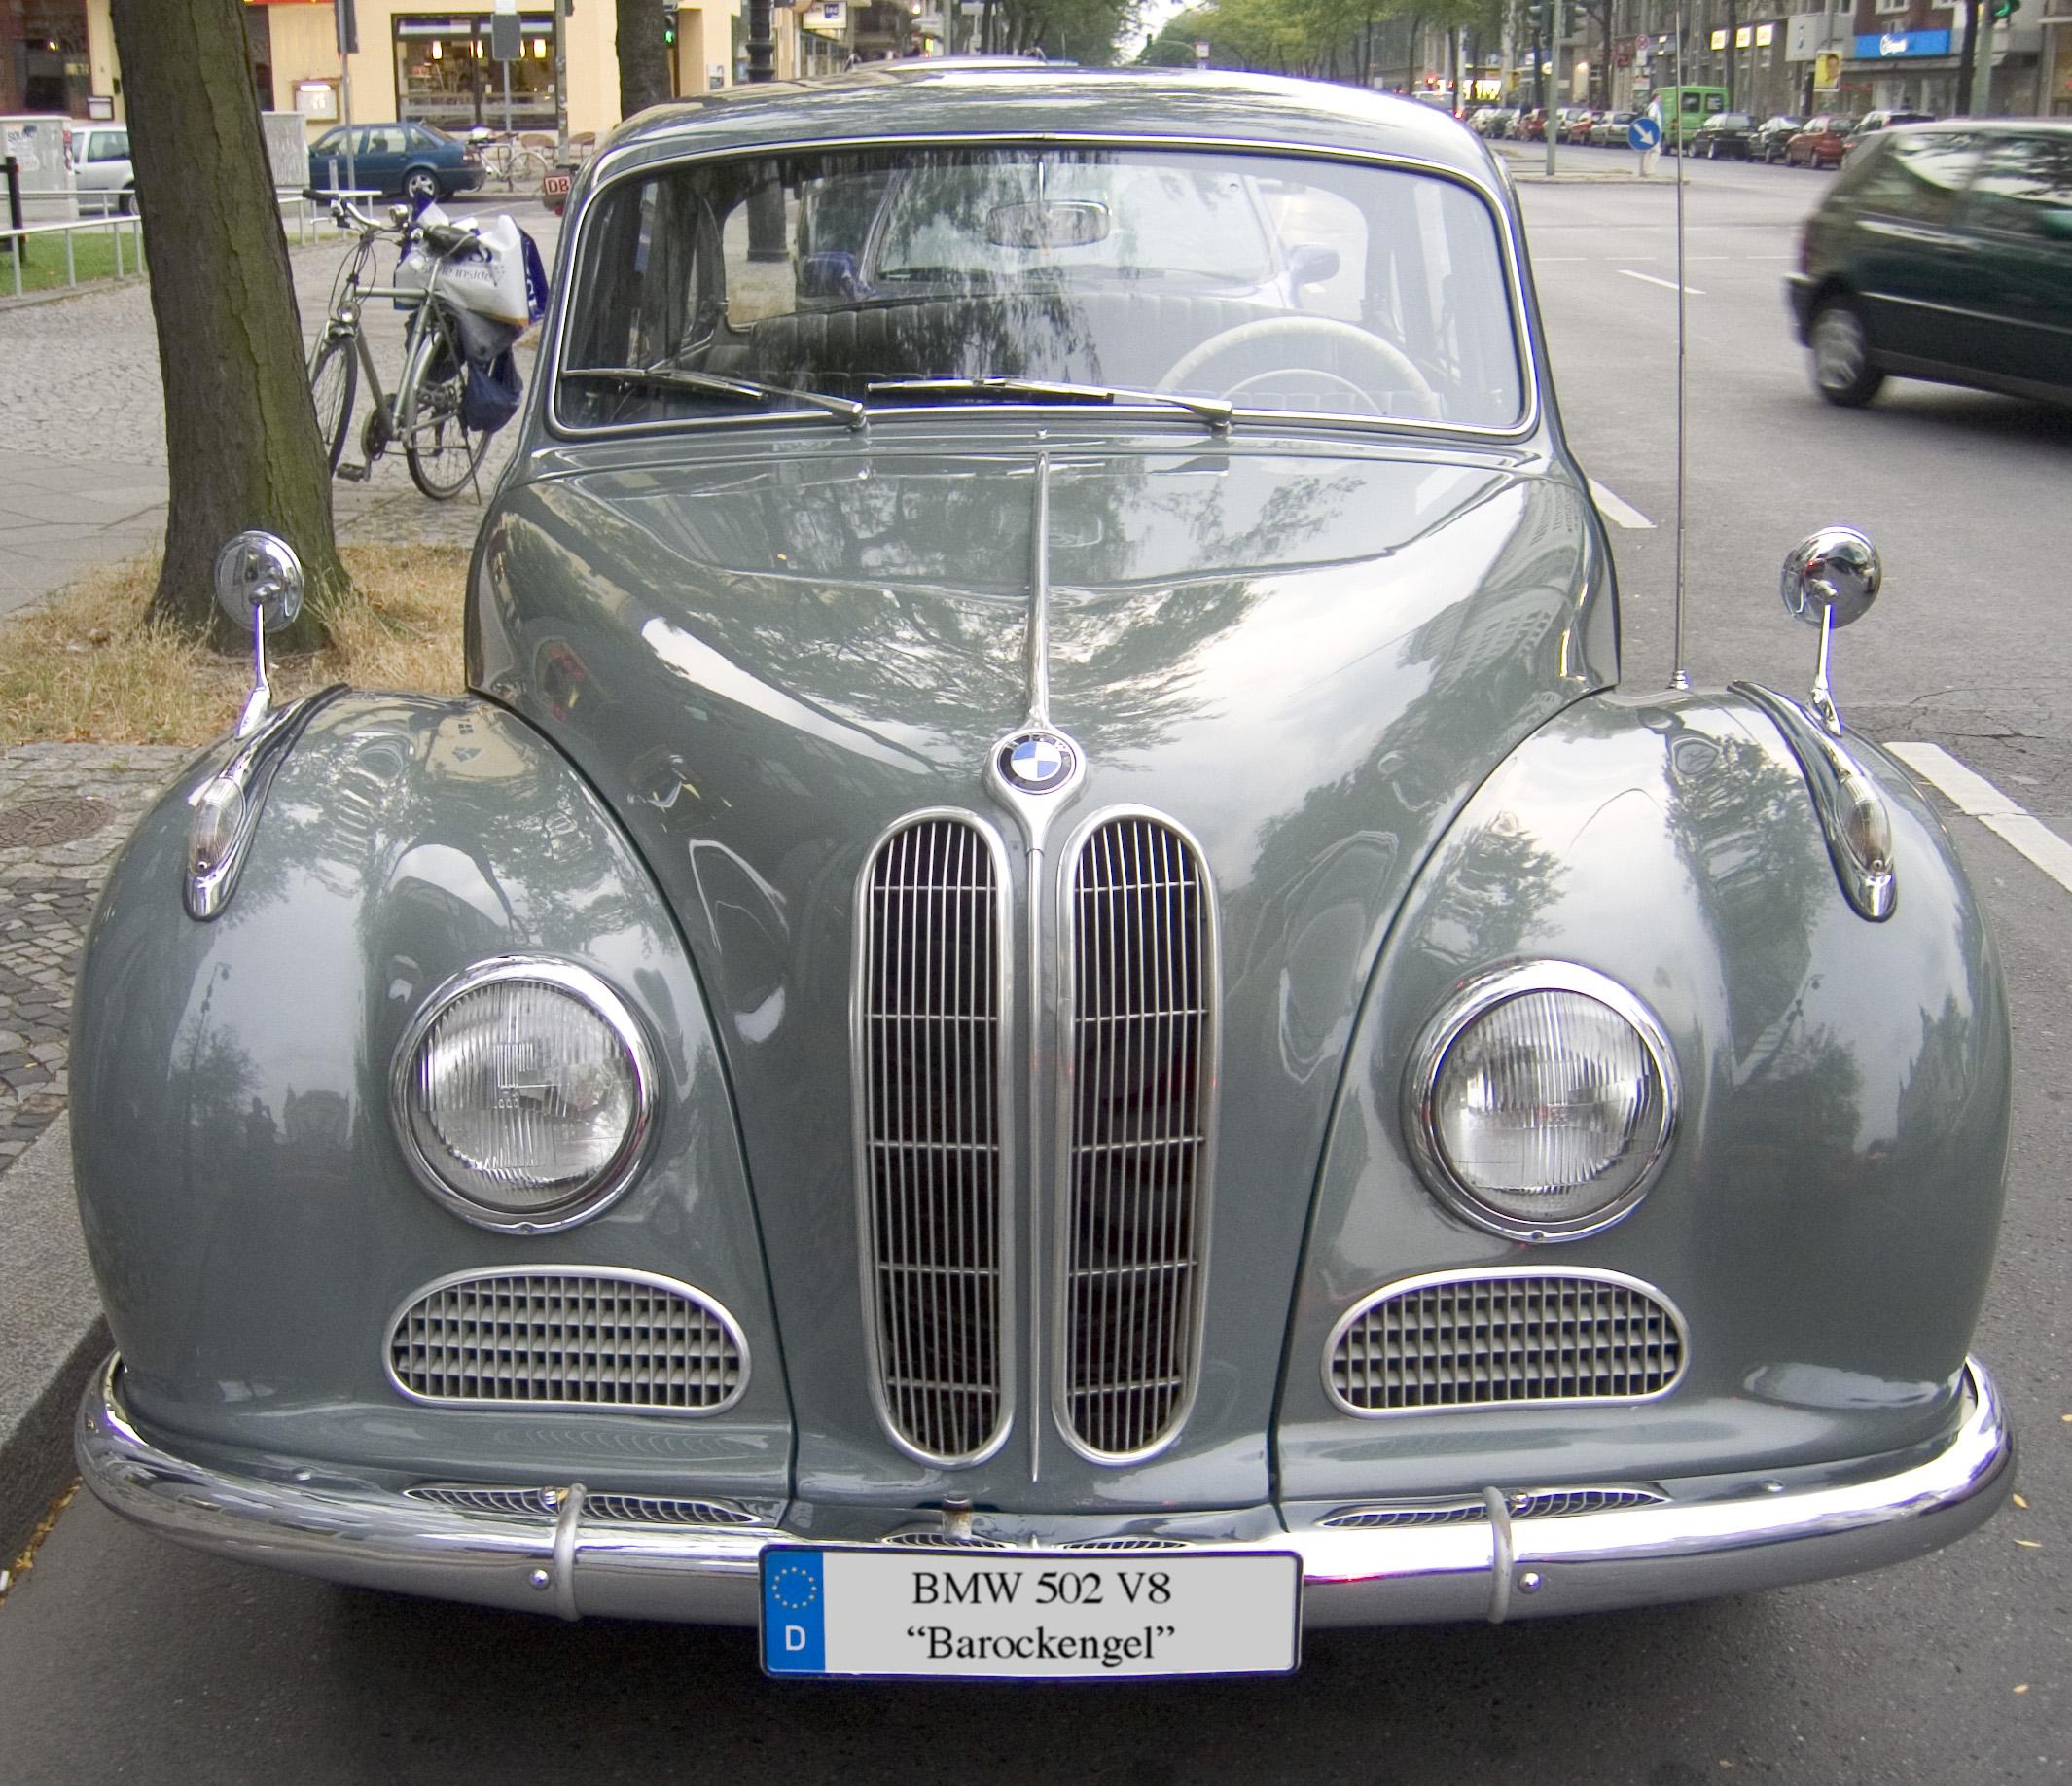 File:BMW Typ 502 V8.jpg - Wikimedia Commons